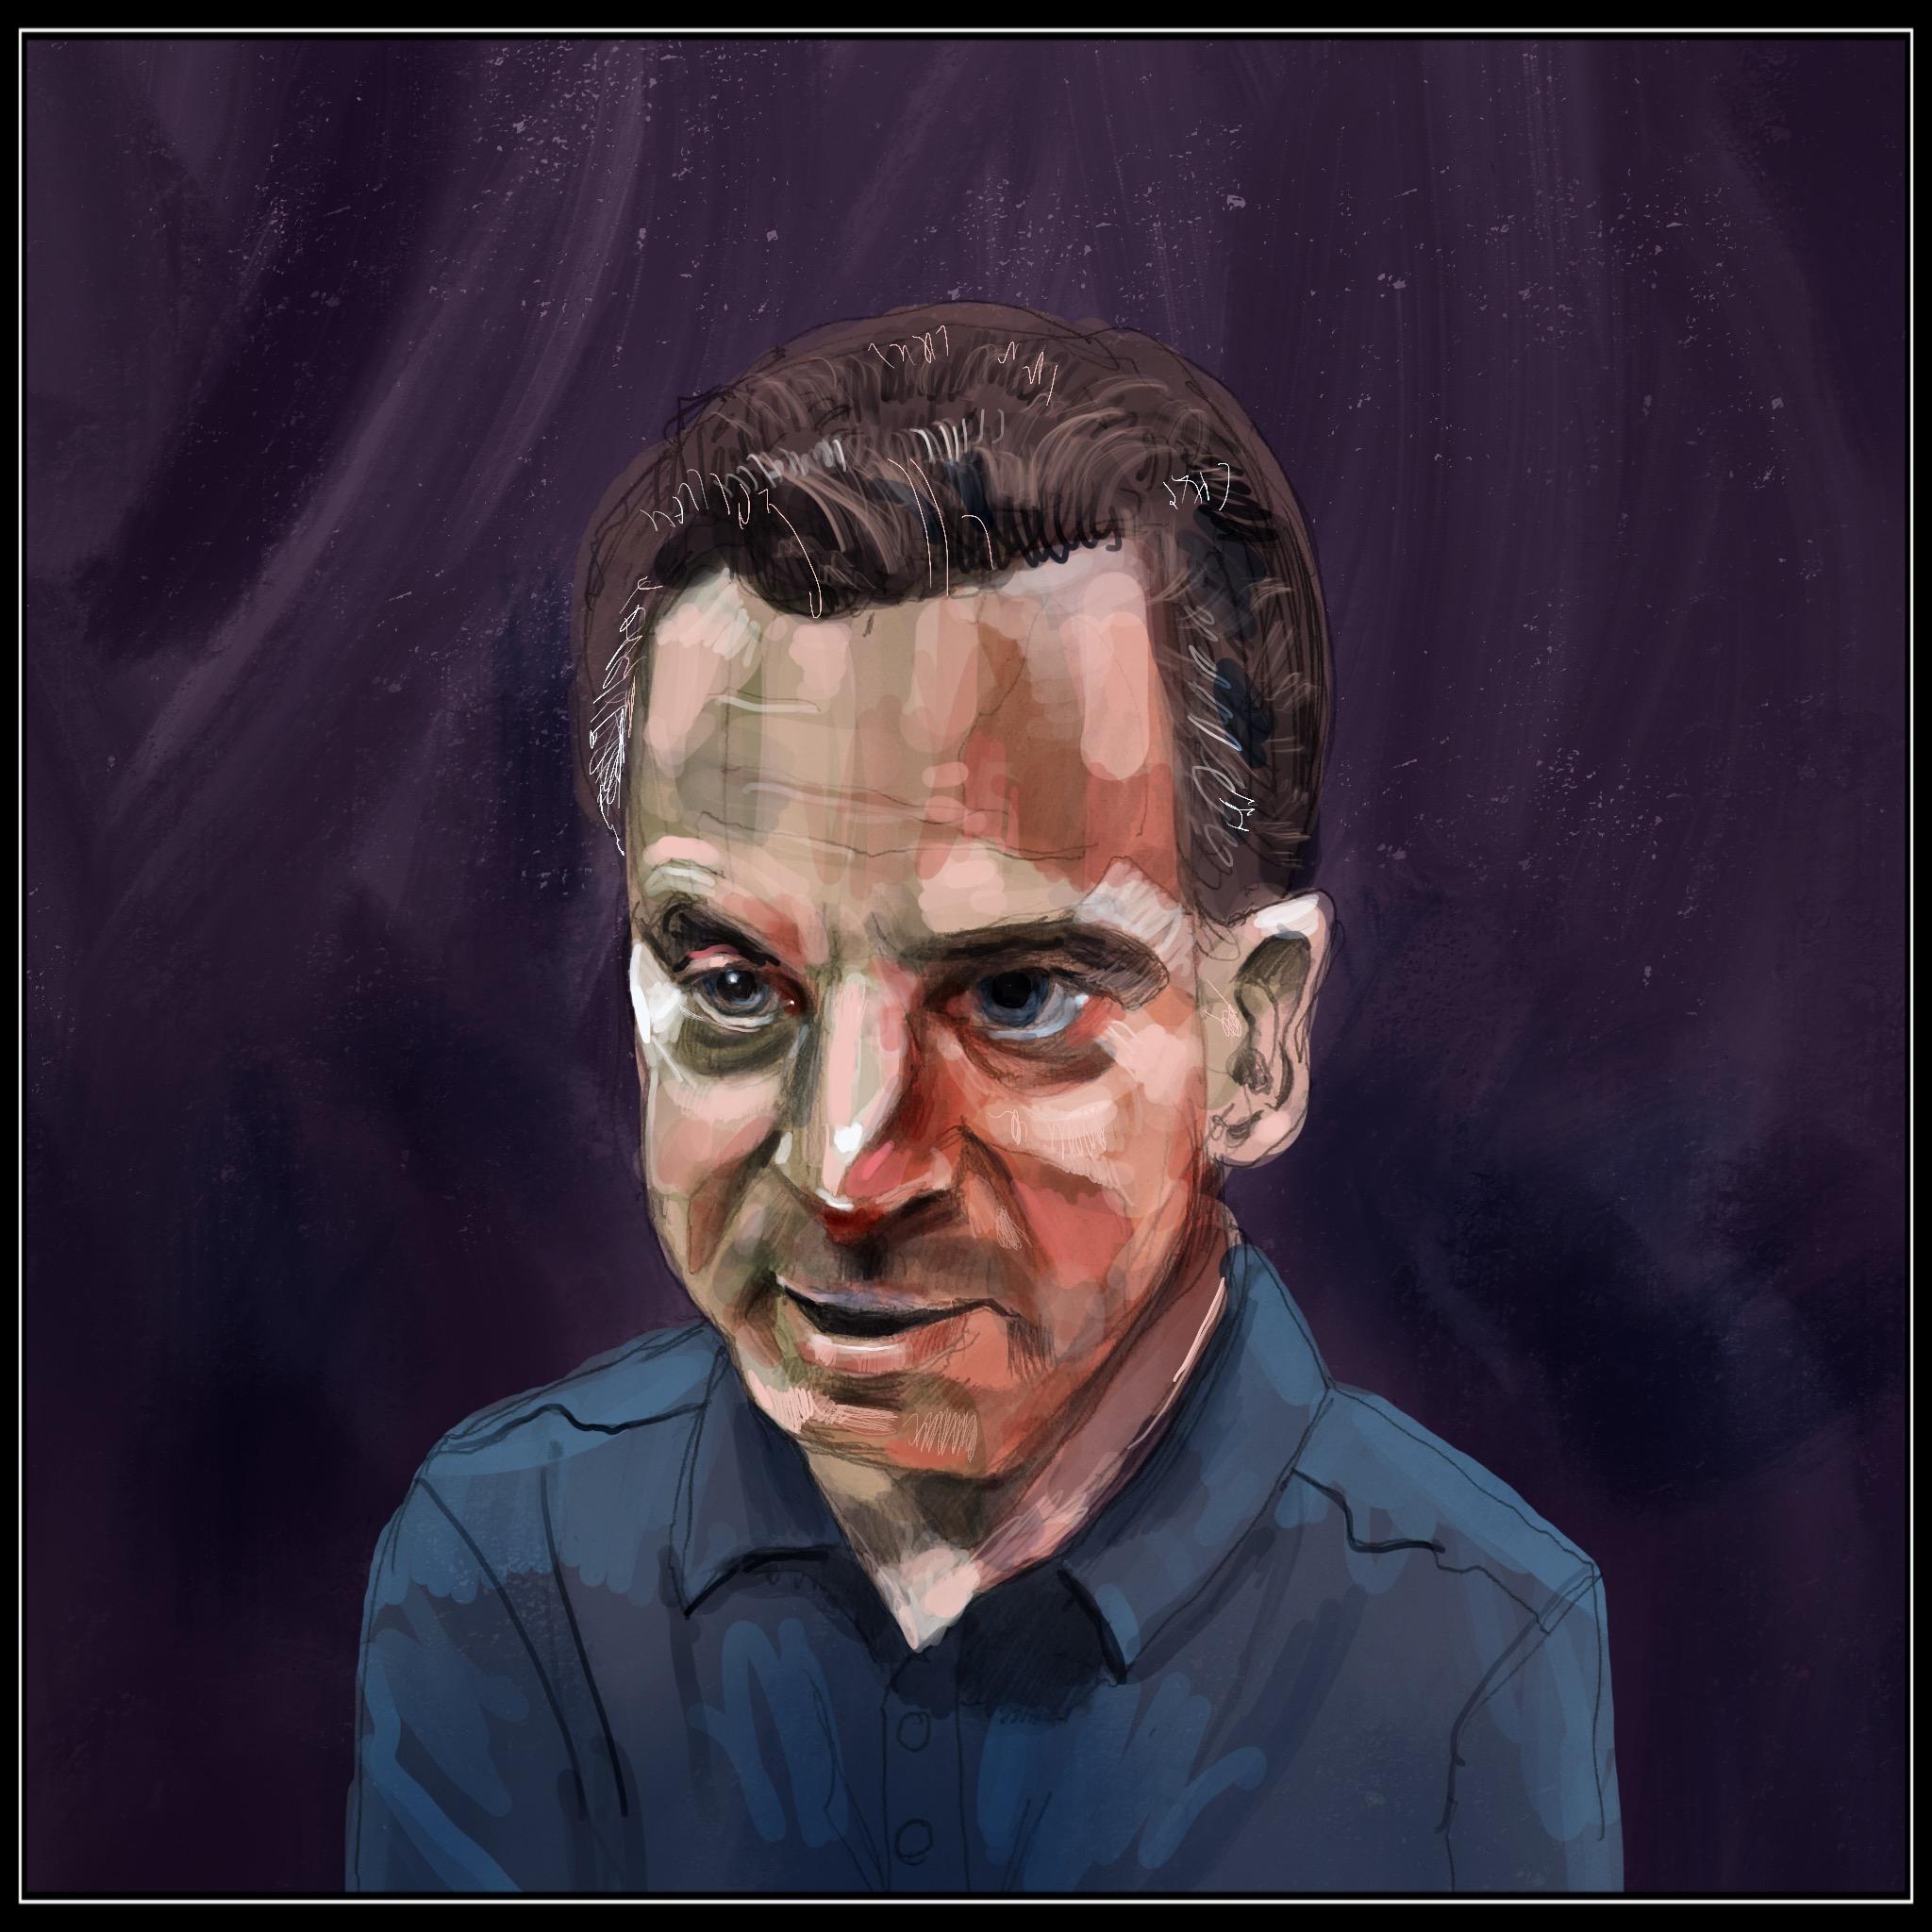 Sam Harris; Neuroscientist, Philosopher & Best-selling Author